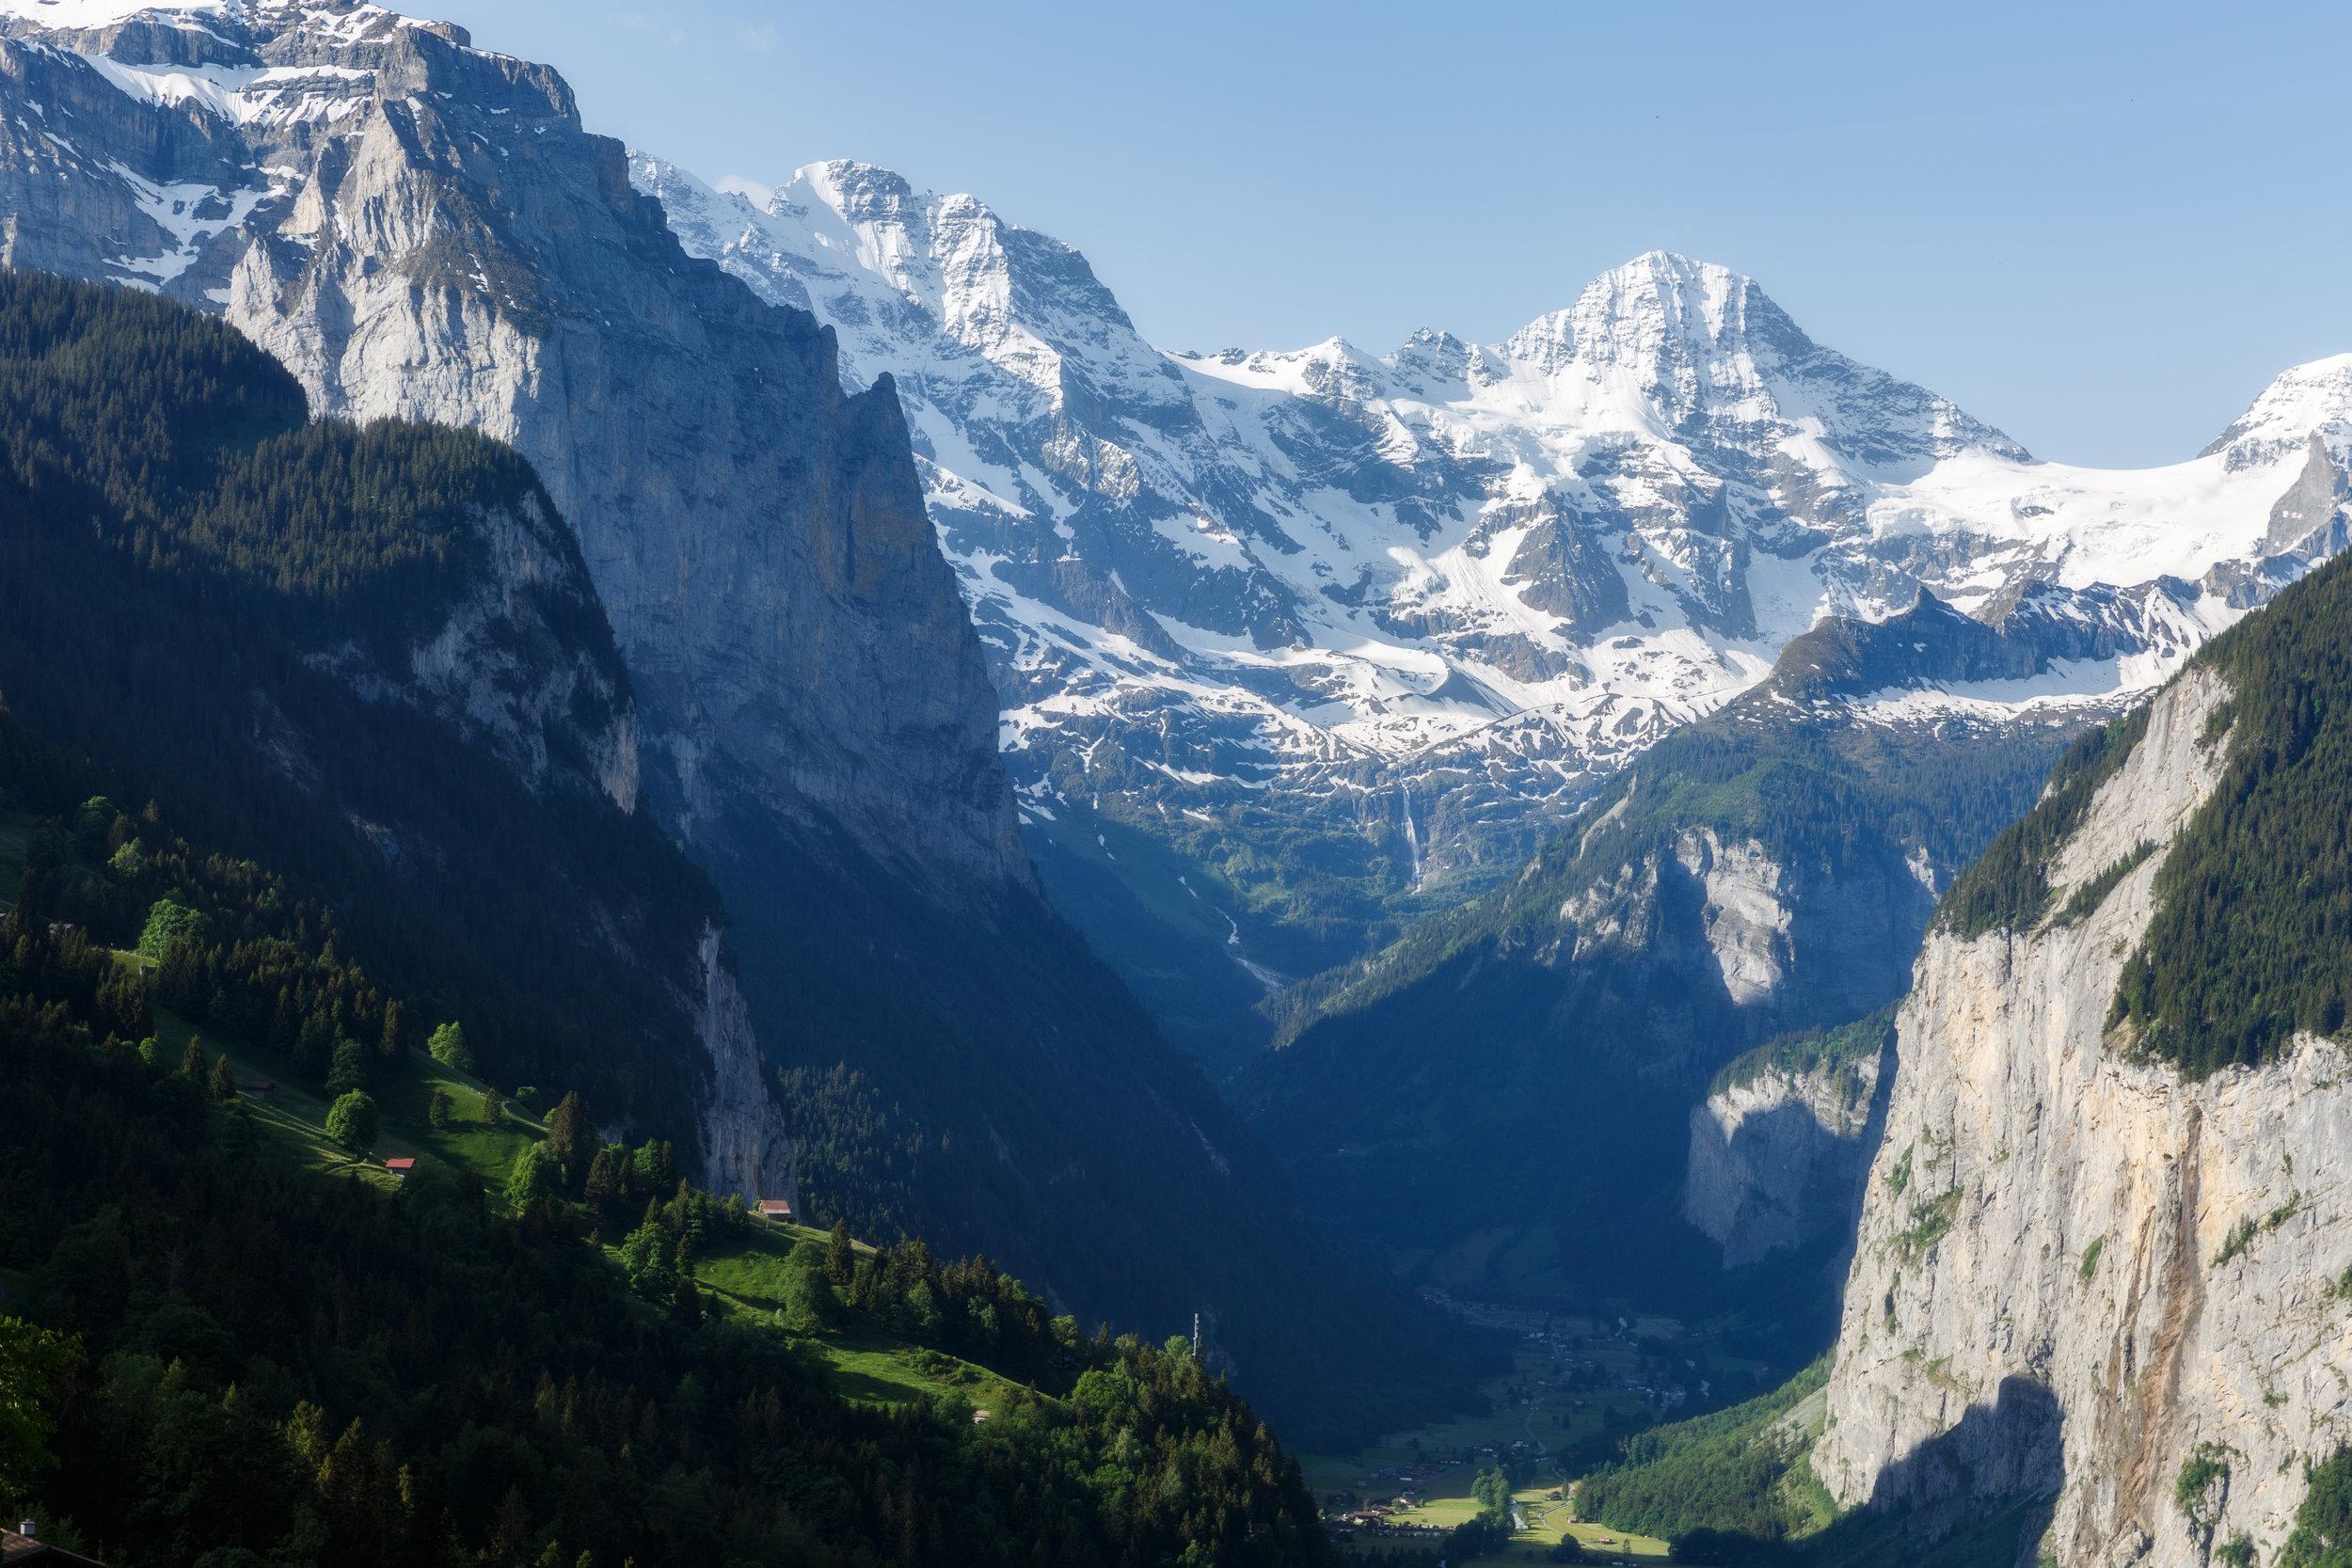 Morning Light on the Mountains Over Lauterbrunnen